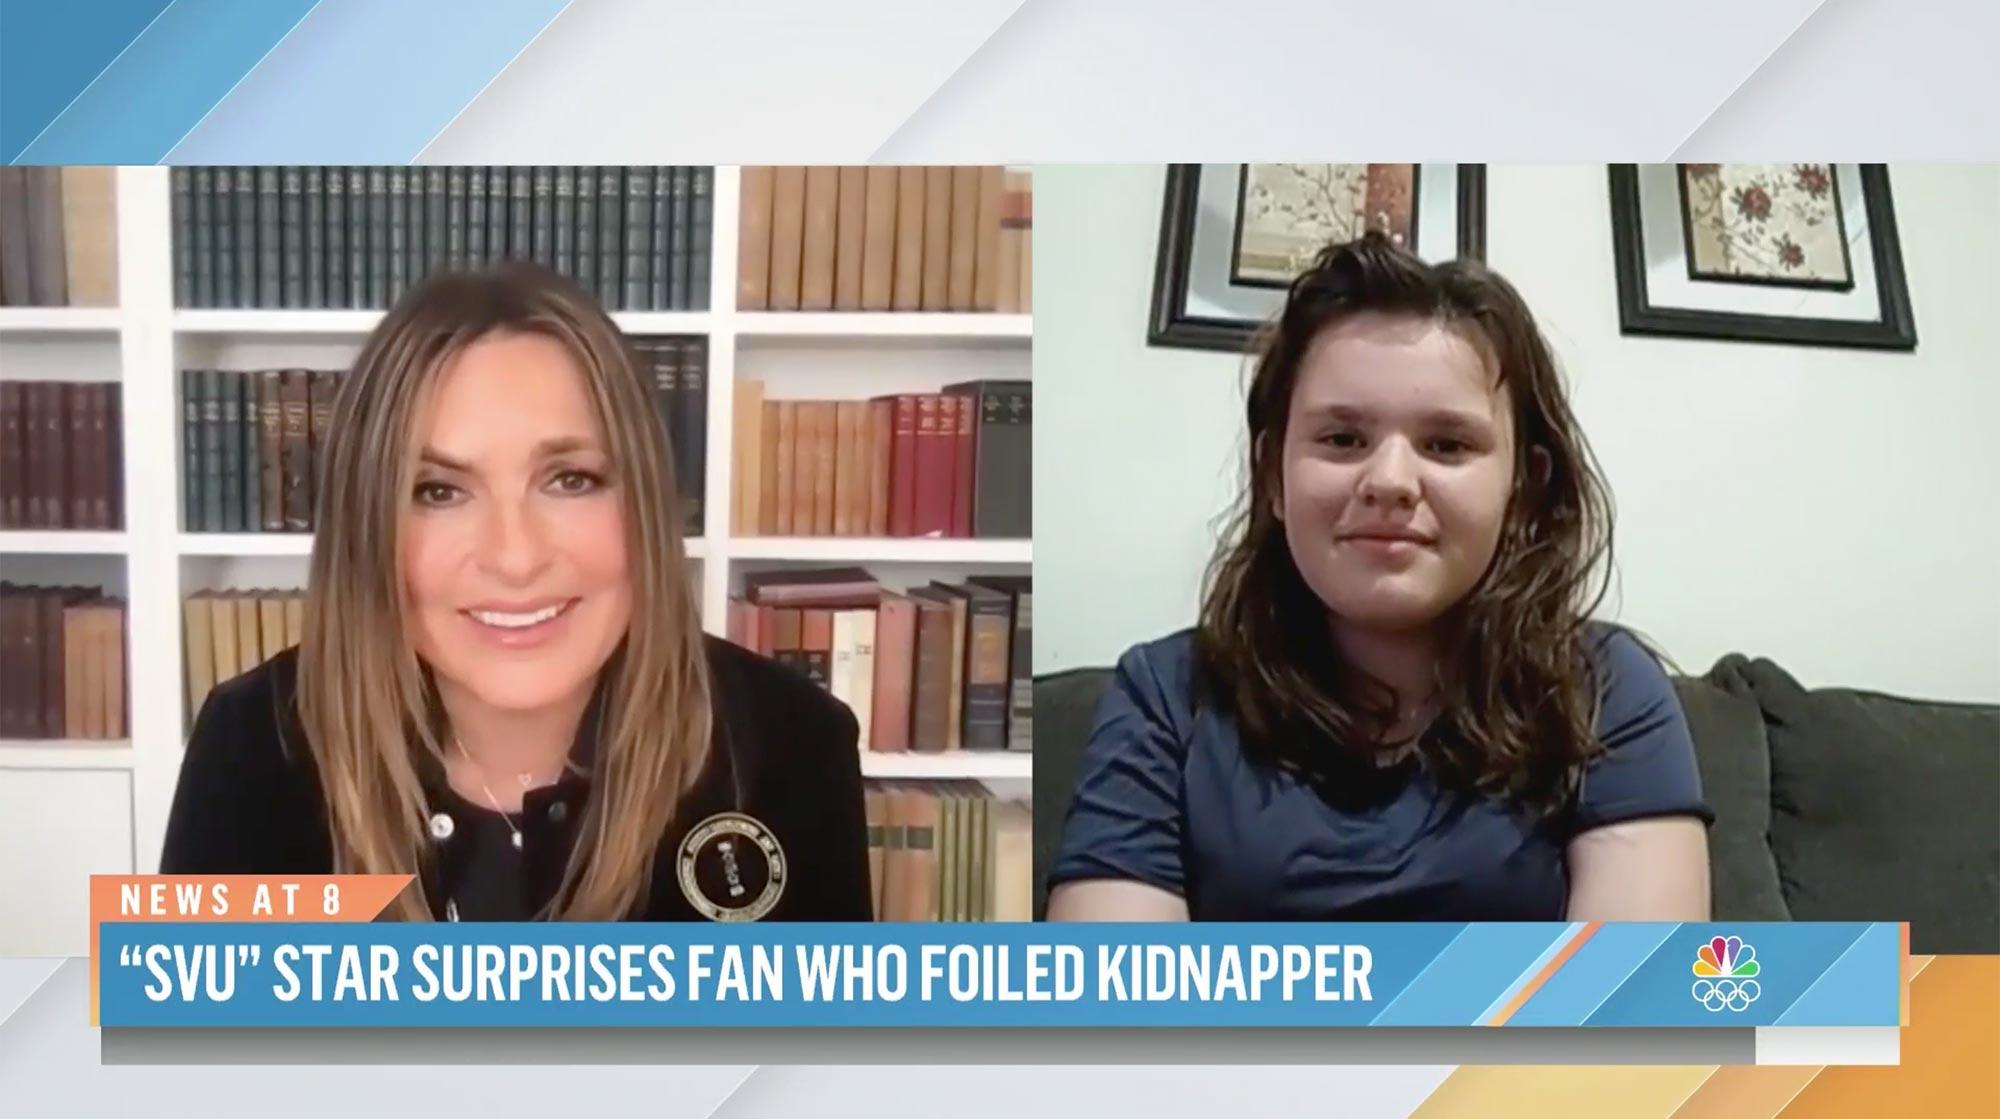 Mariska Hargitay of 'SVU' surprises 11-year-old who fought off attacker